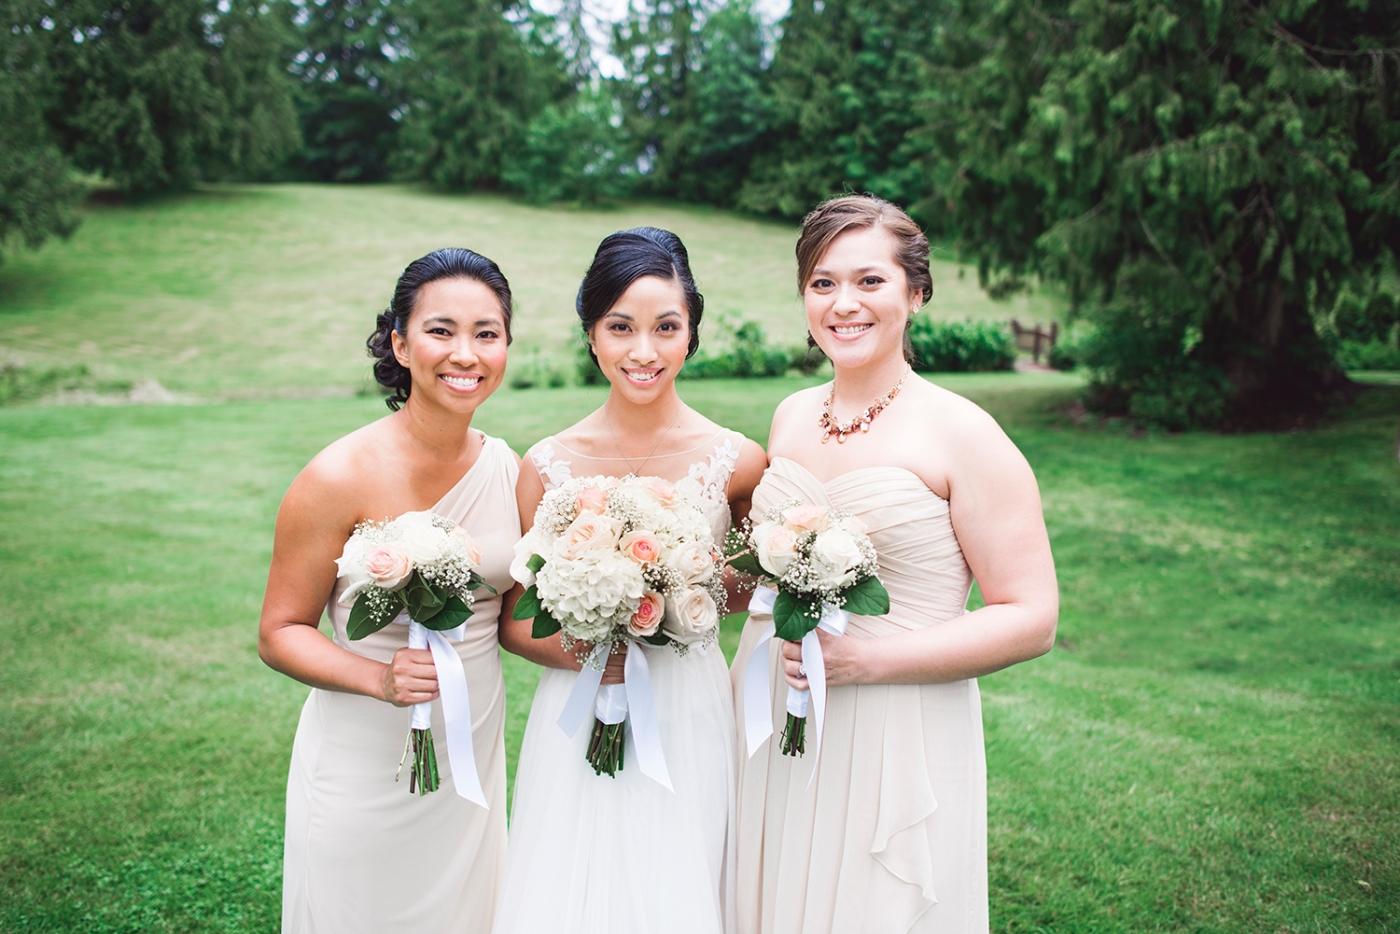 Jane_Speleers_2016_Family_Wedding_Wild_Rose_Estates_Venue_ DSC_DSC_9904